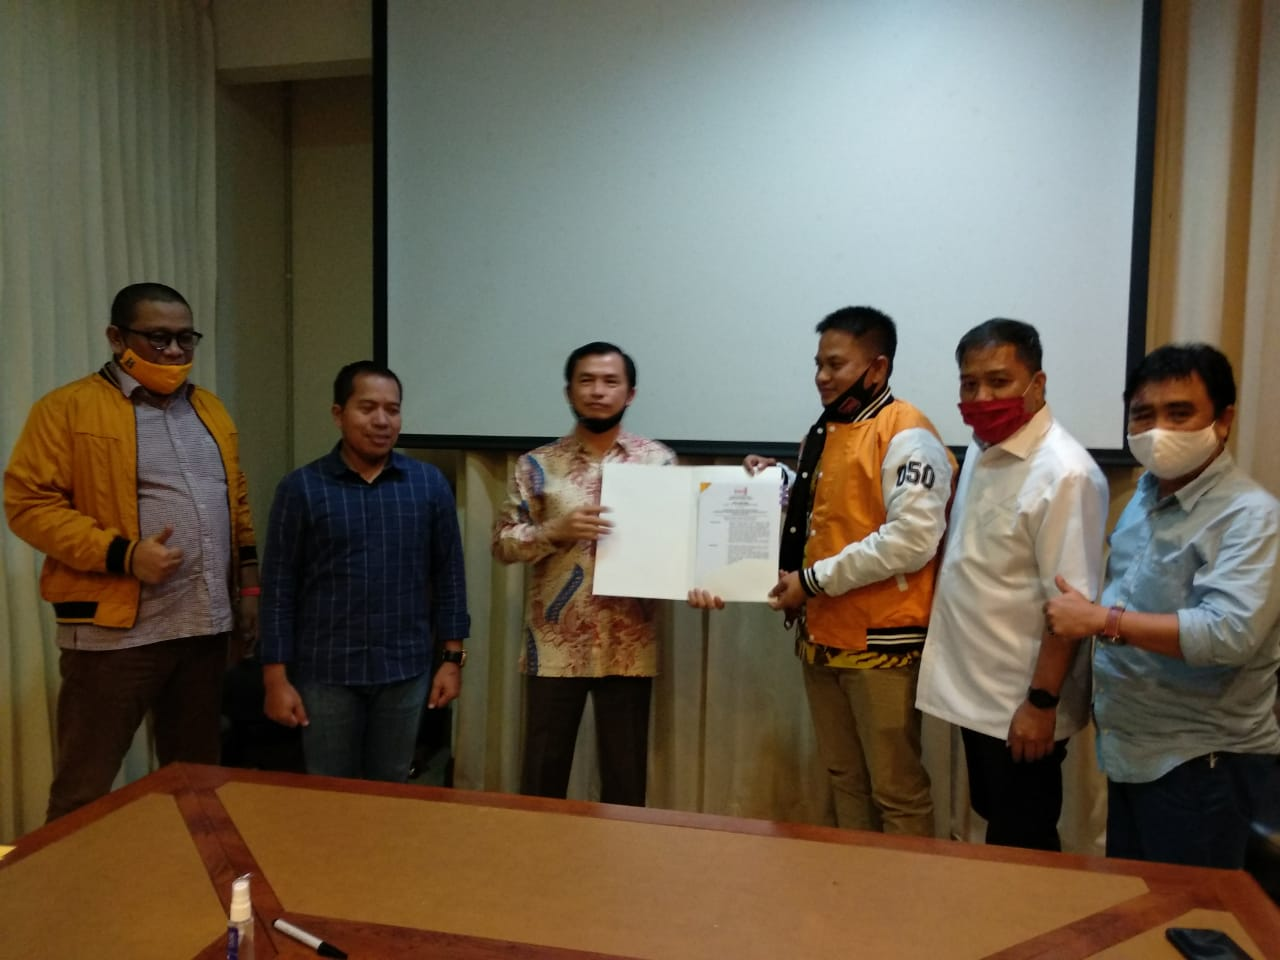 Penyerah Rekomendasi Dukungan Partai Hanura Pada Rusmin Abdul Gani-Senawan Silondae Pada Pilkada Konawe Selatan (Foto : Istimewa)